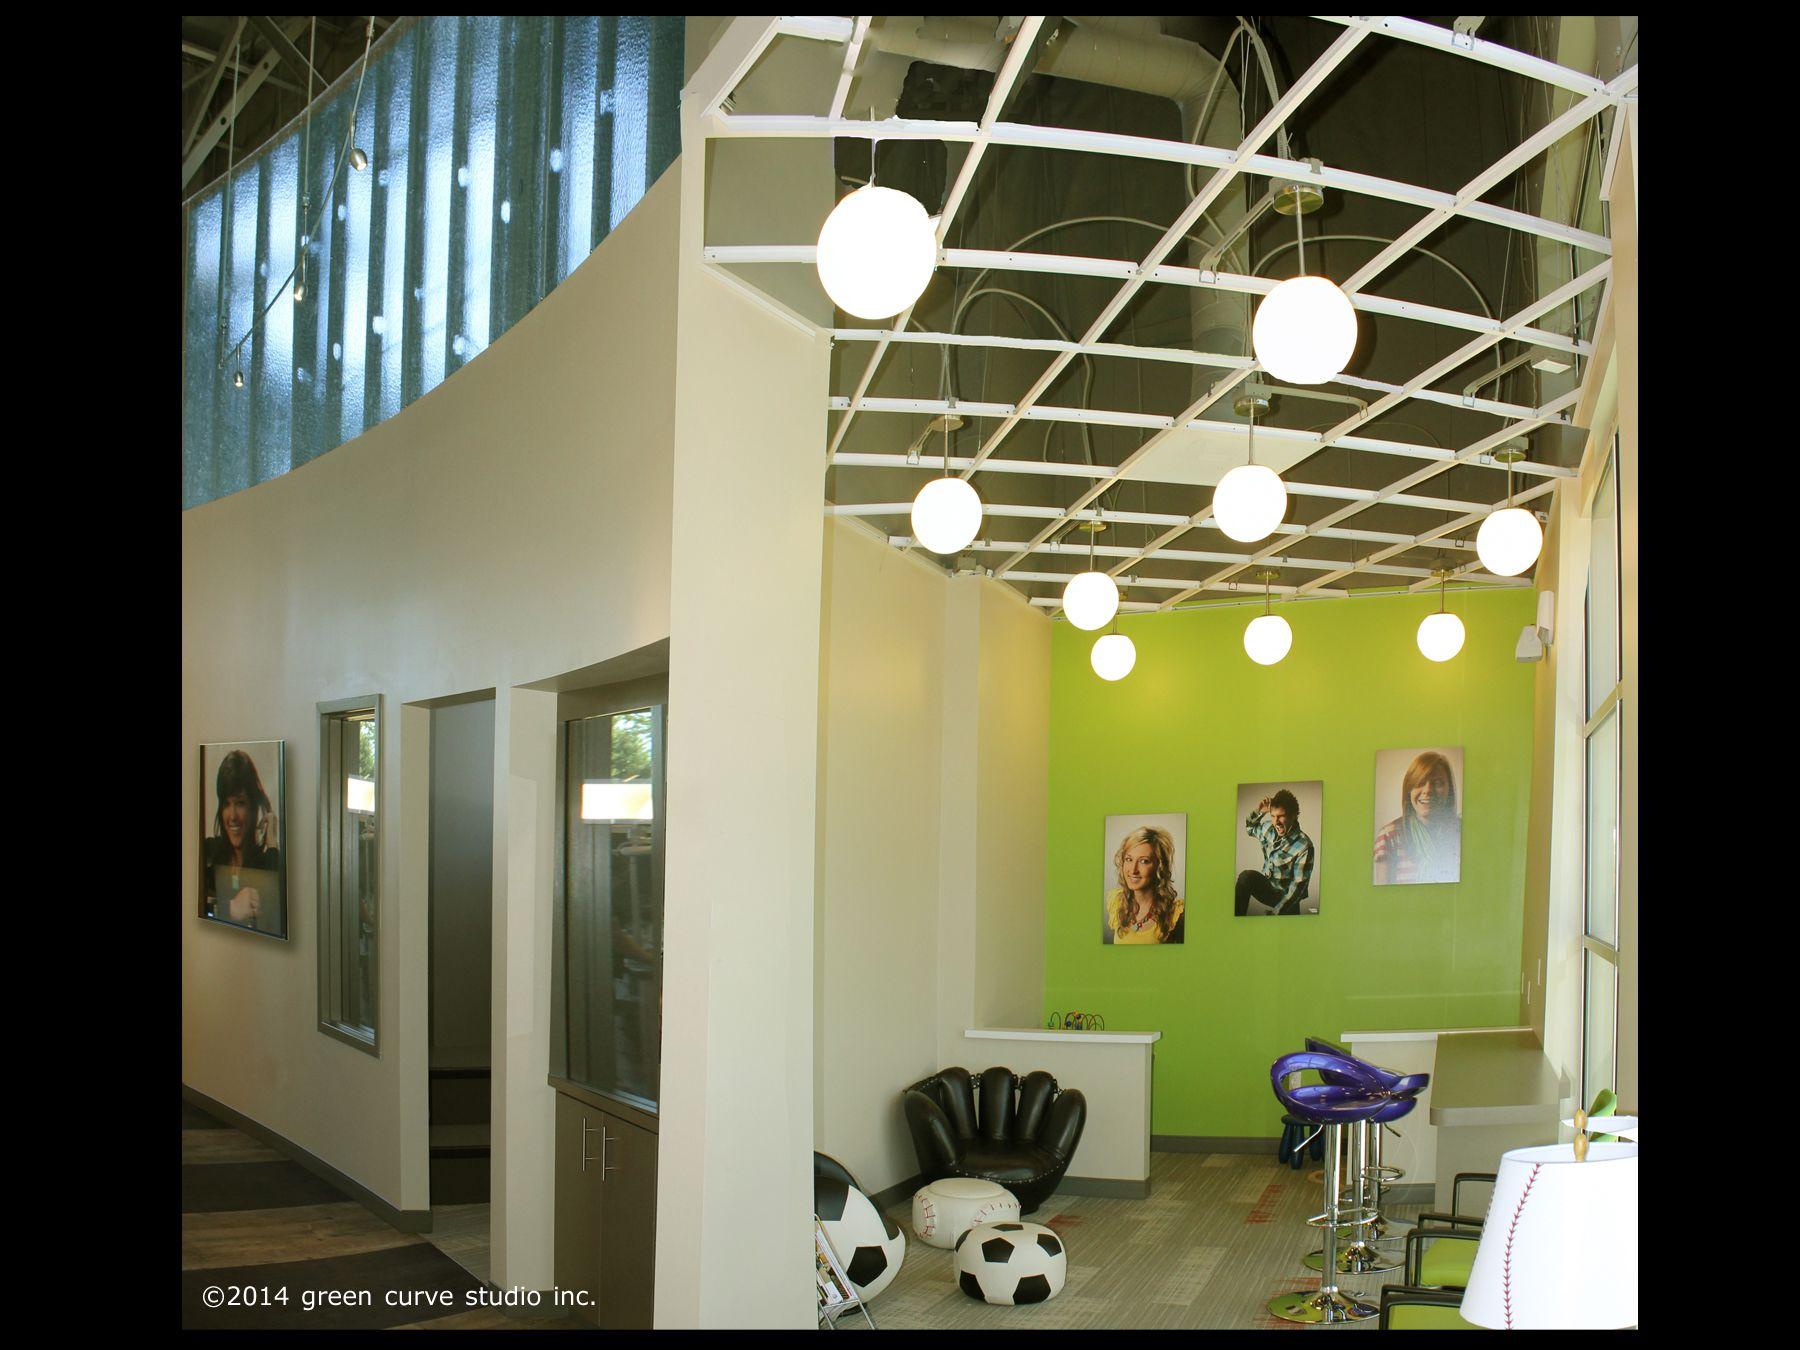 All Star Orthodontics Vancouver Wa Modern Interior Design Healthcare Interior Design Orthodontic Office Design